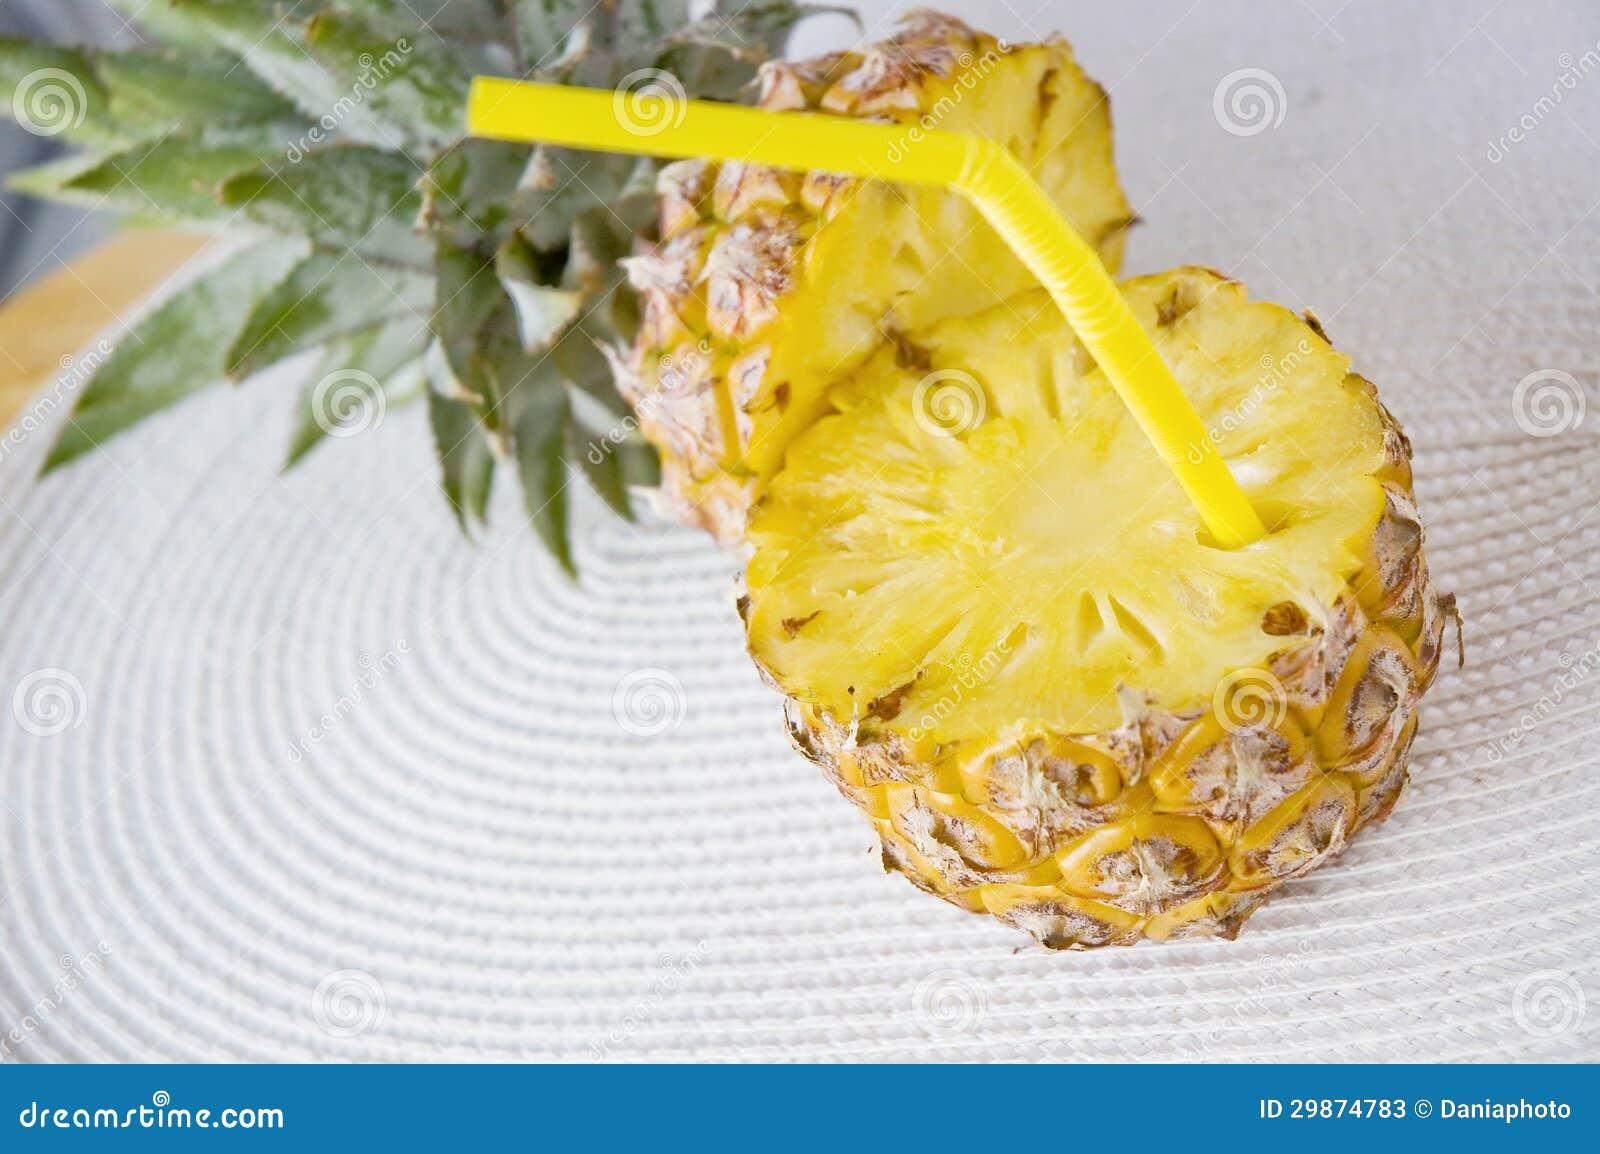 Half of fresh pineapple